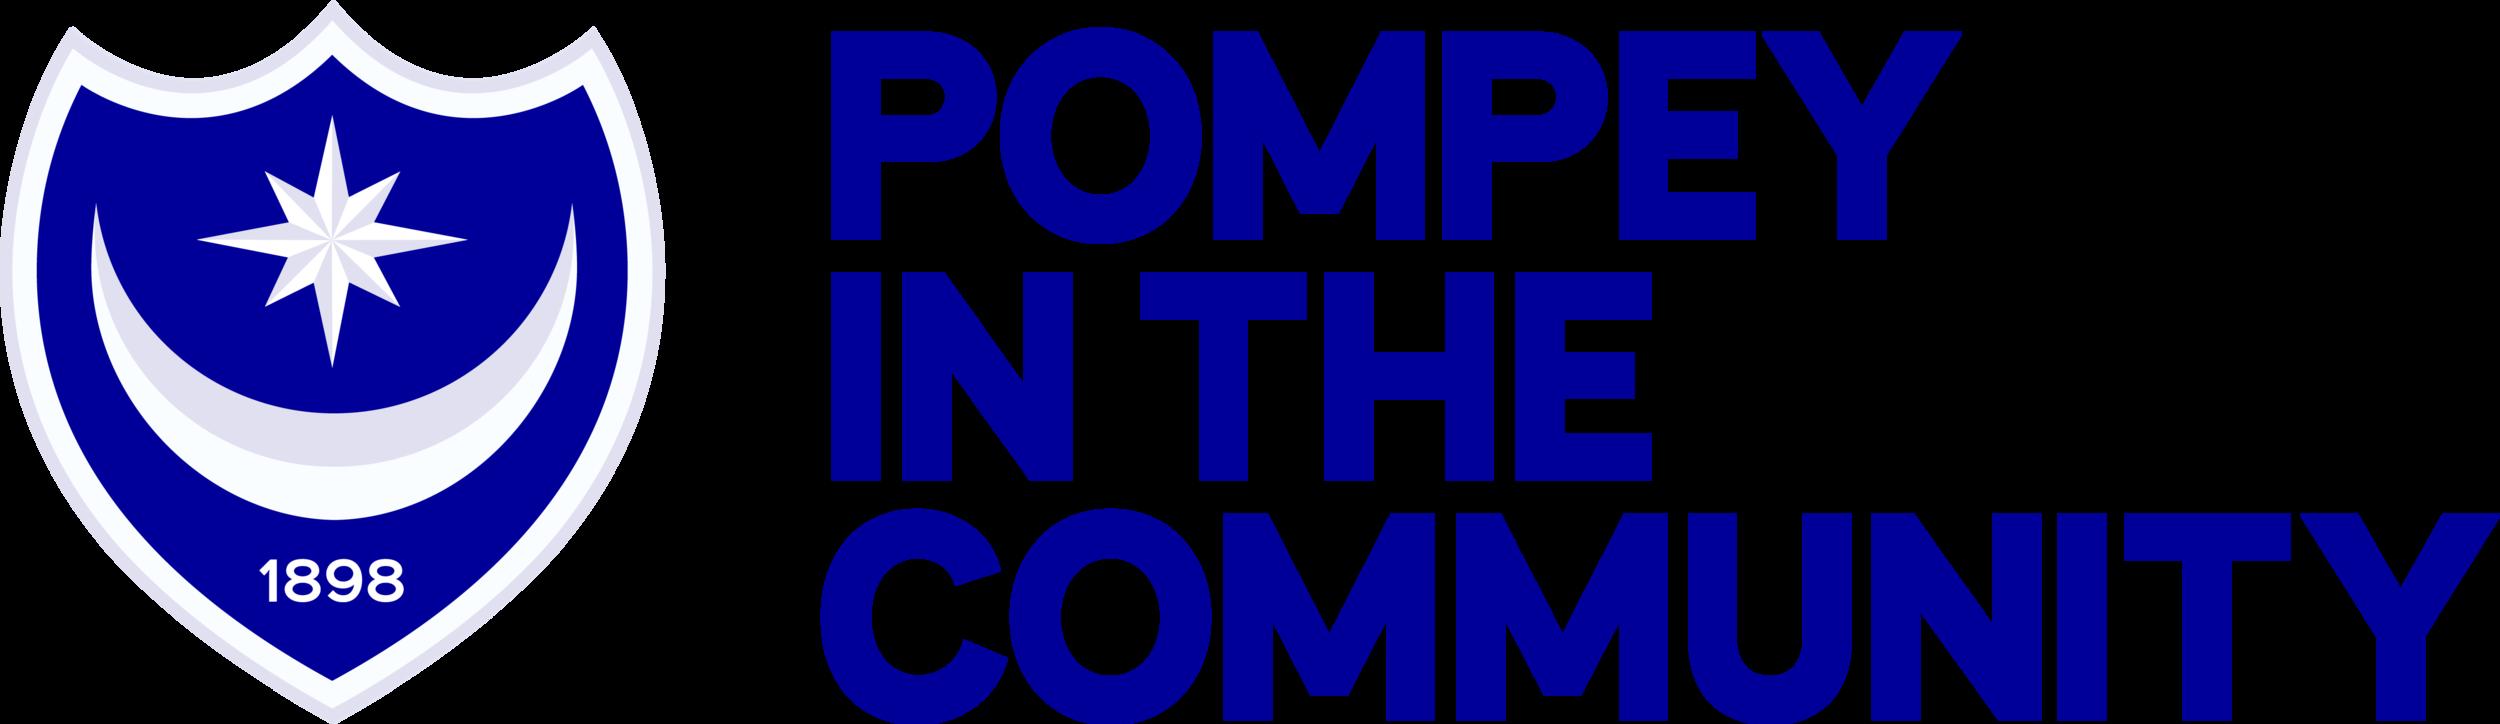 pompey in the community team locals client